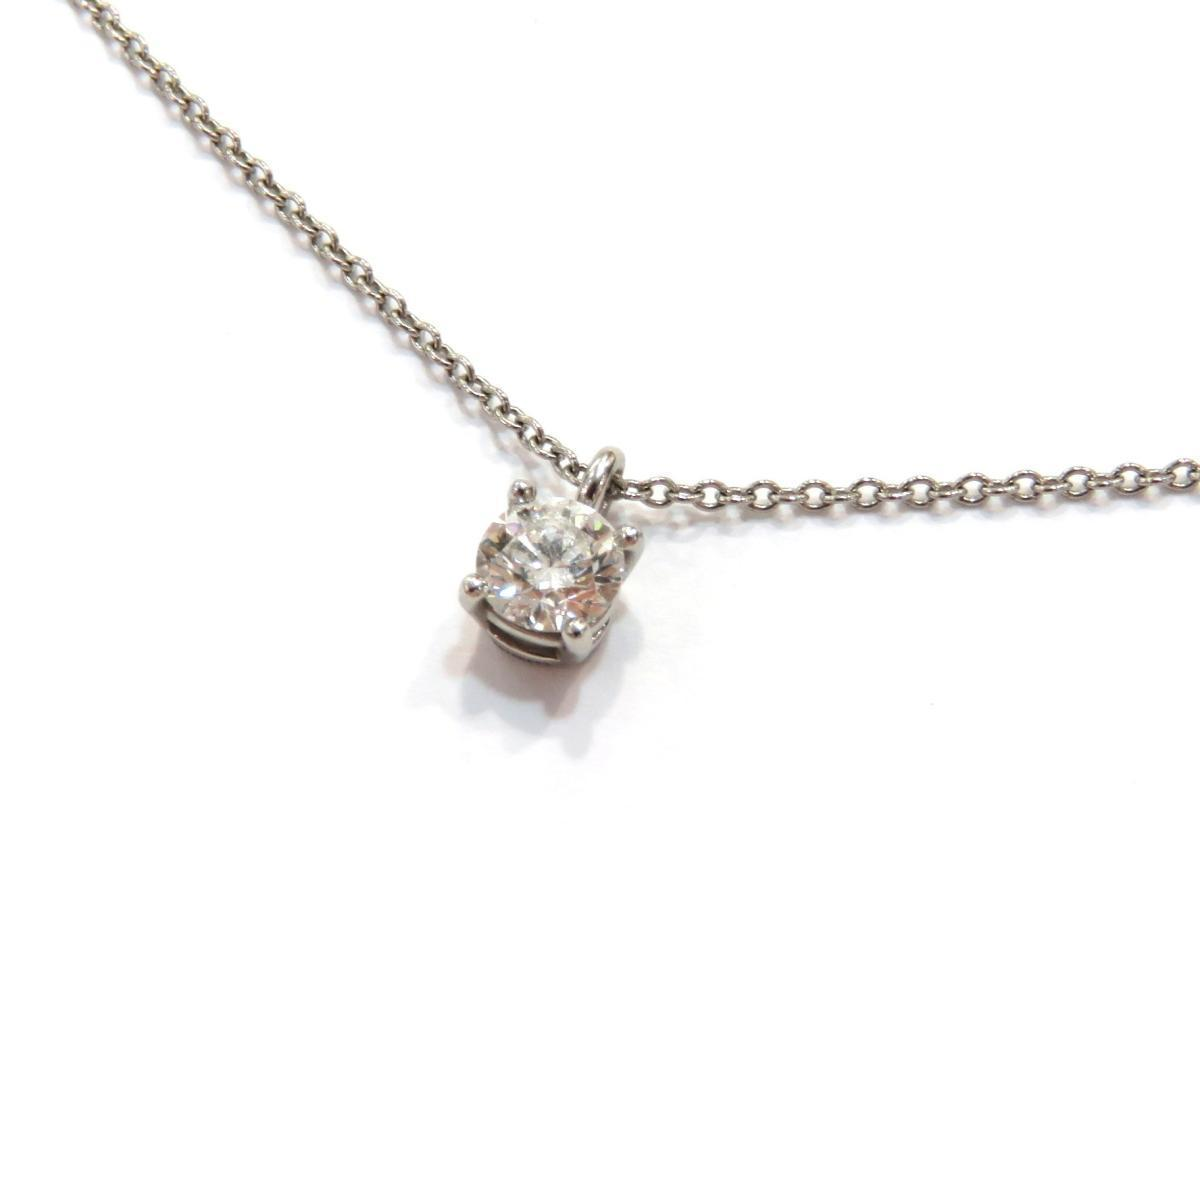 TIFFANY & CO Solitaire Necklace Ladies PT950 Diamond